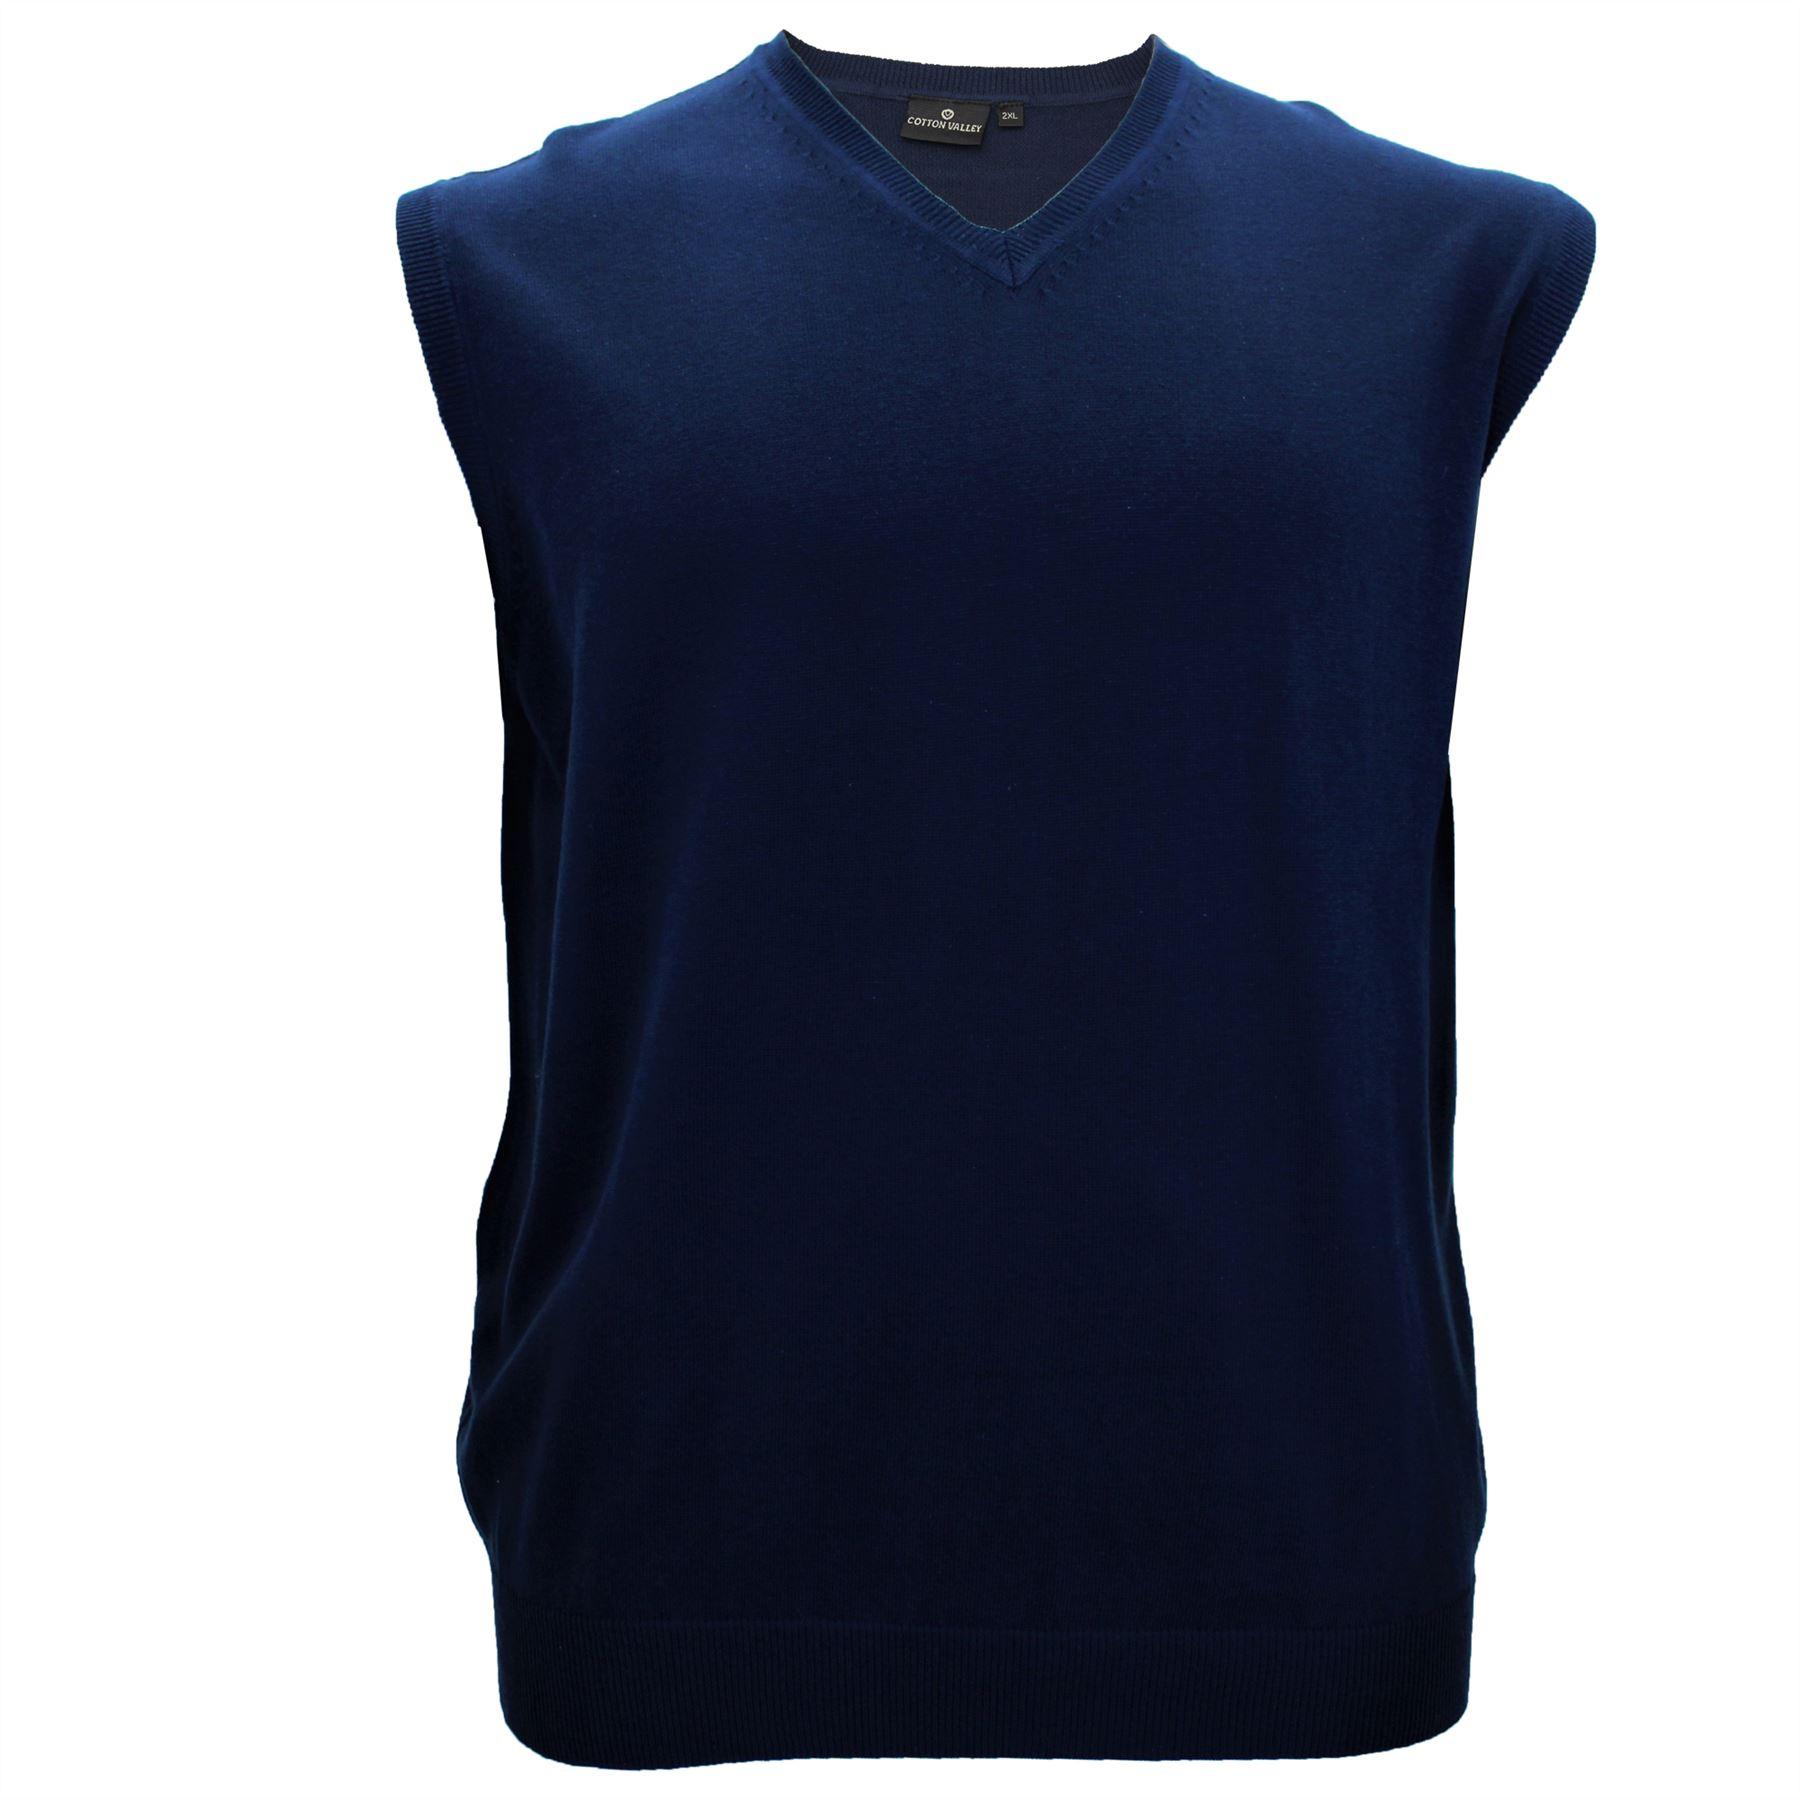 ebfdcb90ef025b Mens Big Size Cotton Valley V-Neck Sleeveless Sweater Vest Jumper ...